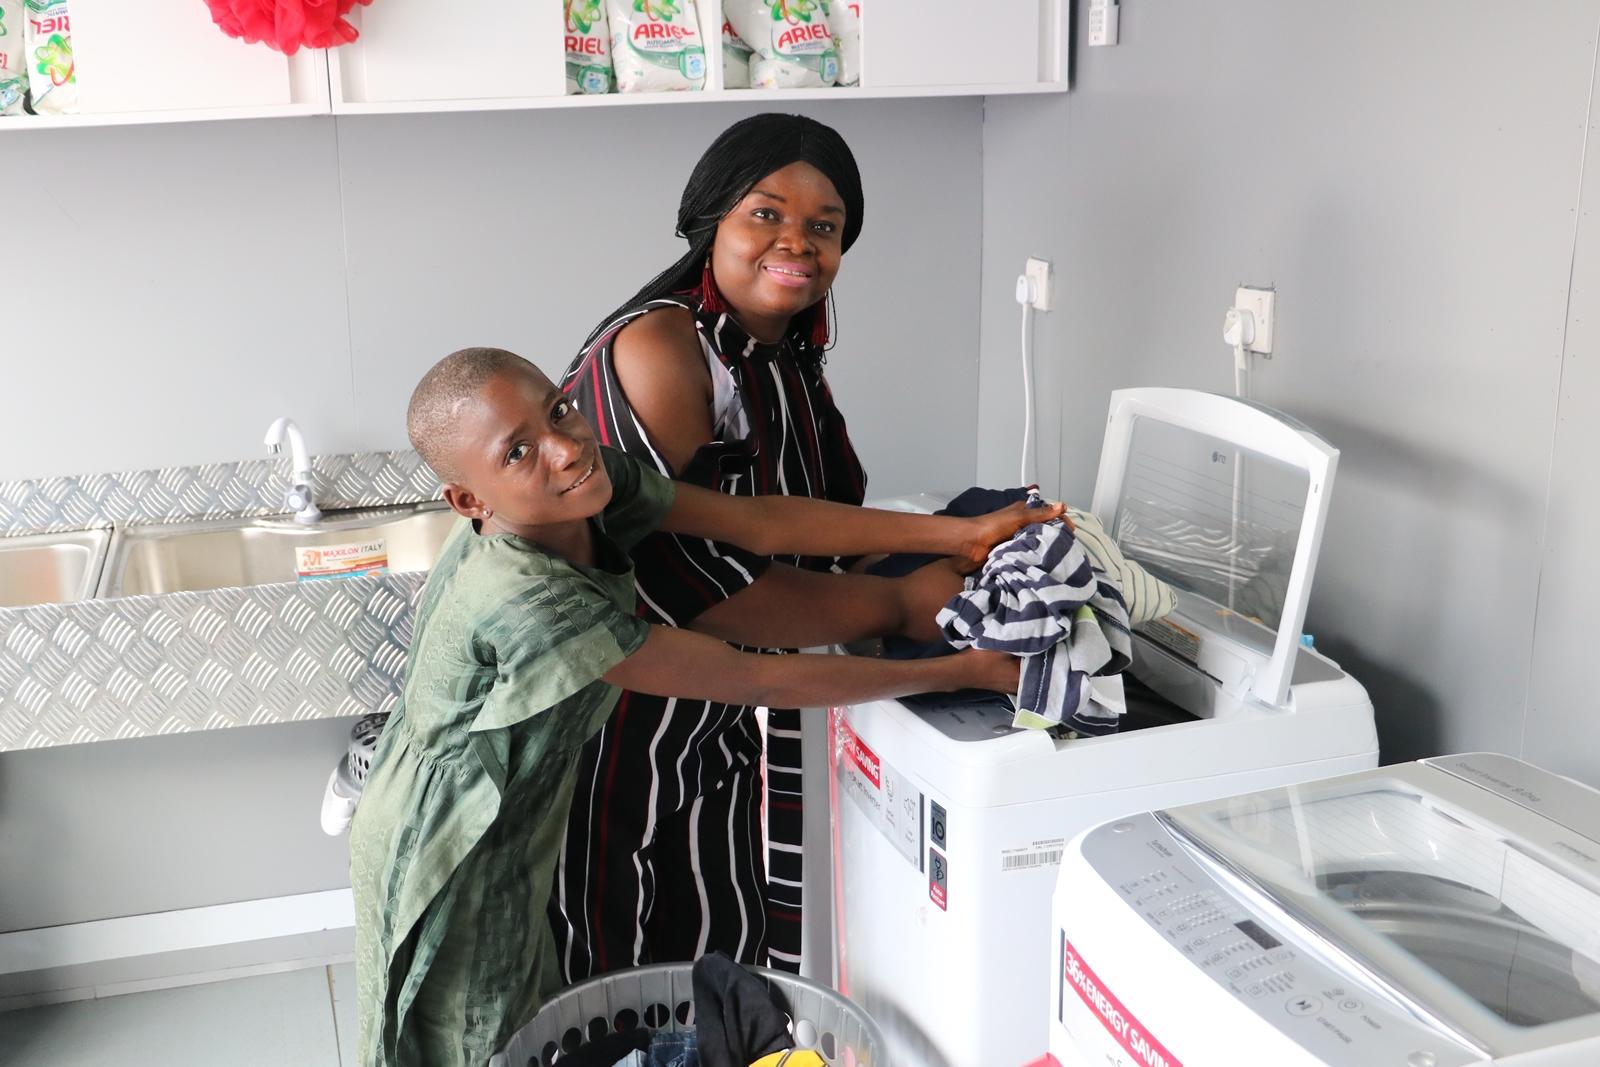 LG전자가 최근 나이지리아 음보음바 마을에 무료 세탁방인 '라이프스 굿 위드 LG 워시(Life's Good with LG Wash)'를 열었다. 현지 주민이 무료 세탁방에서 세탁기를 체험해보고 있다.